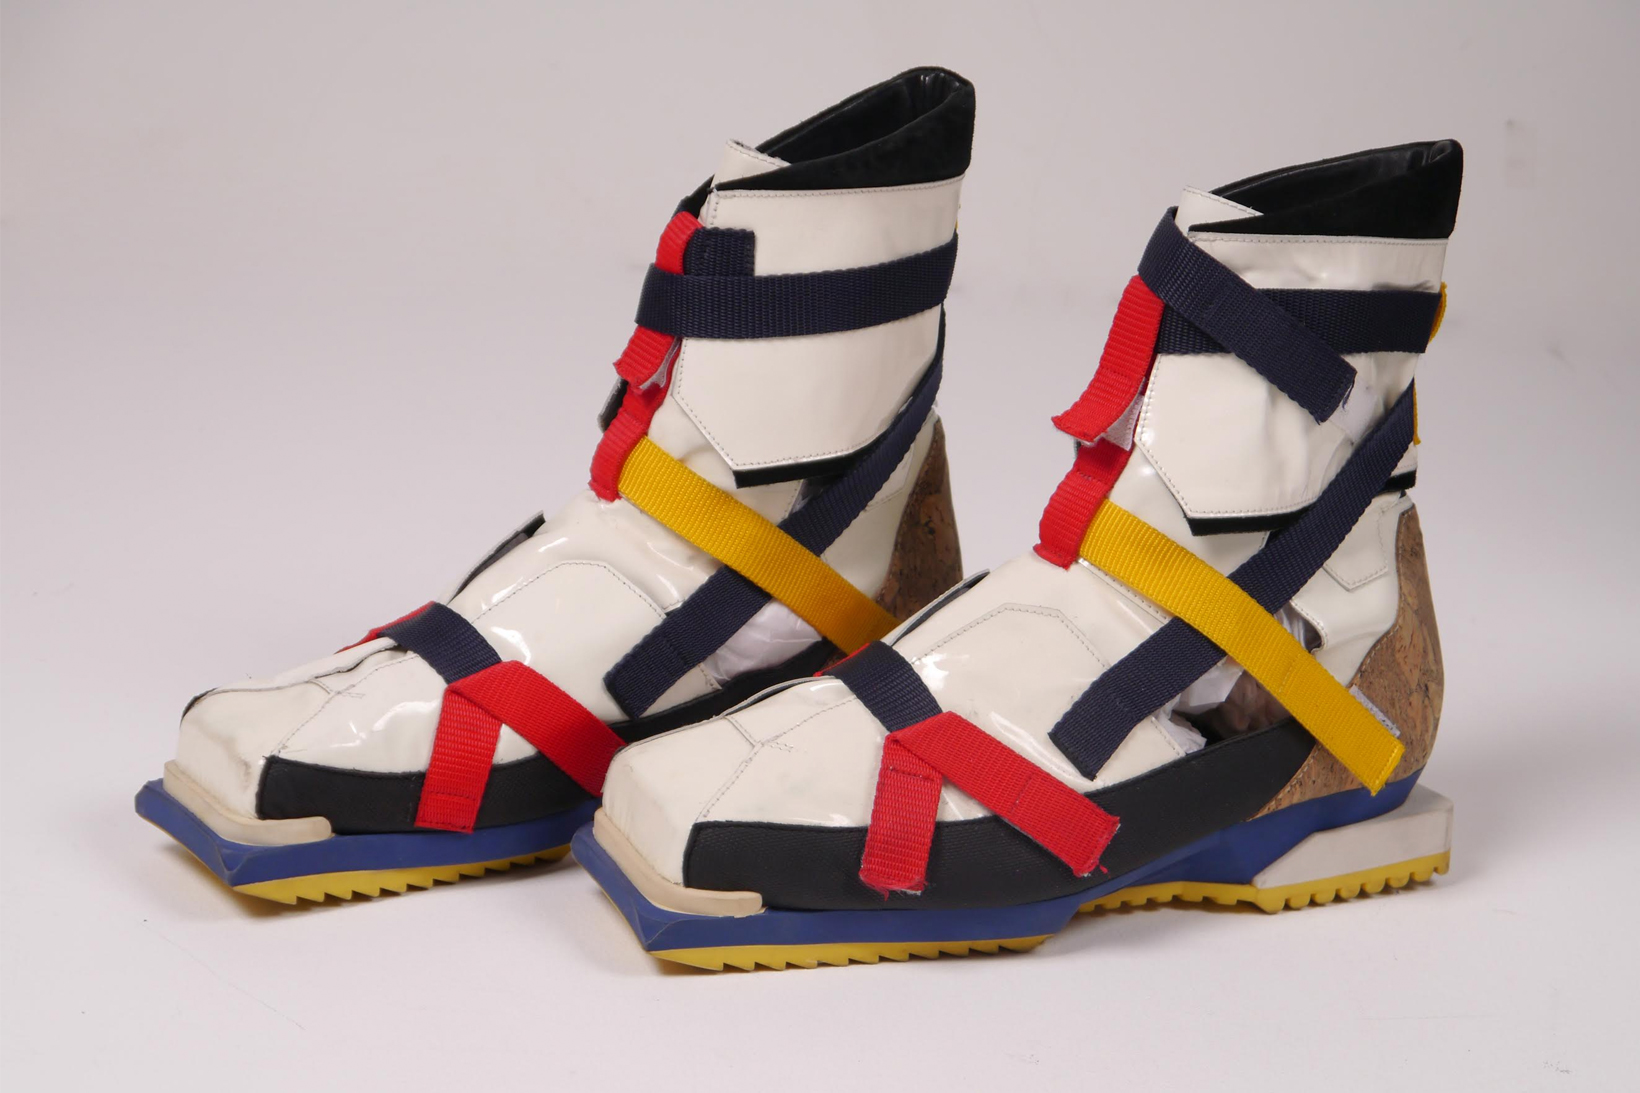 Rare Raf Simons 'De Stijl' Hiking Boot